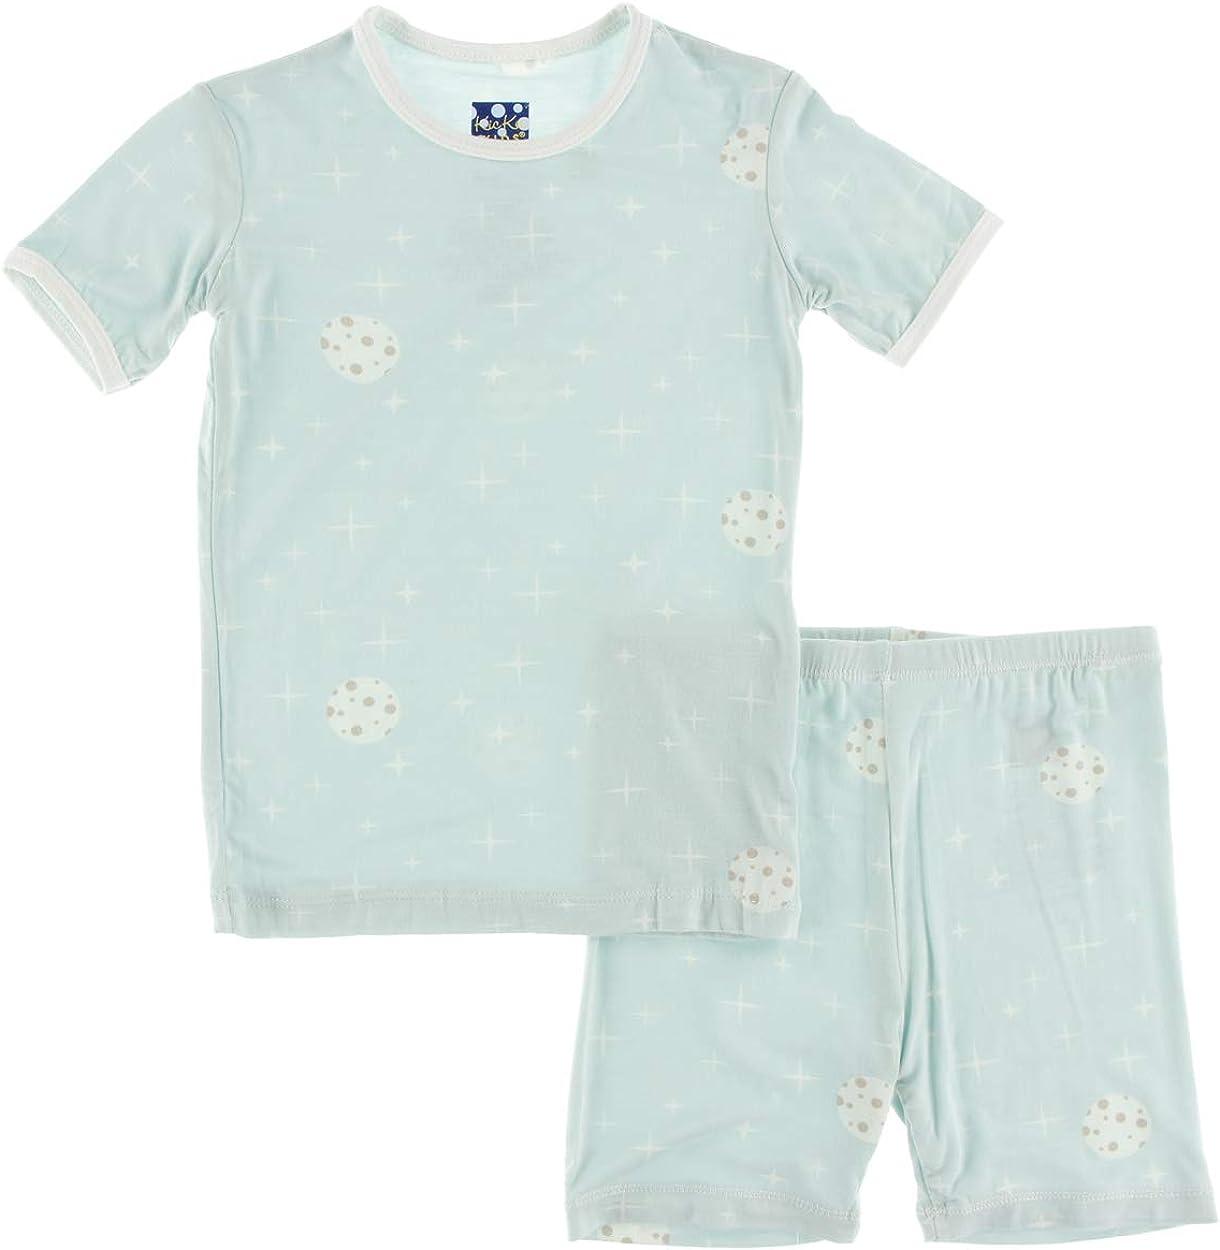 KicKee Pants Print Short Sleeve Pajama Set with Shorts in Desert Rose Indian Train